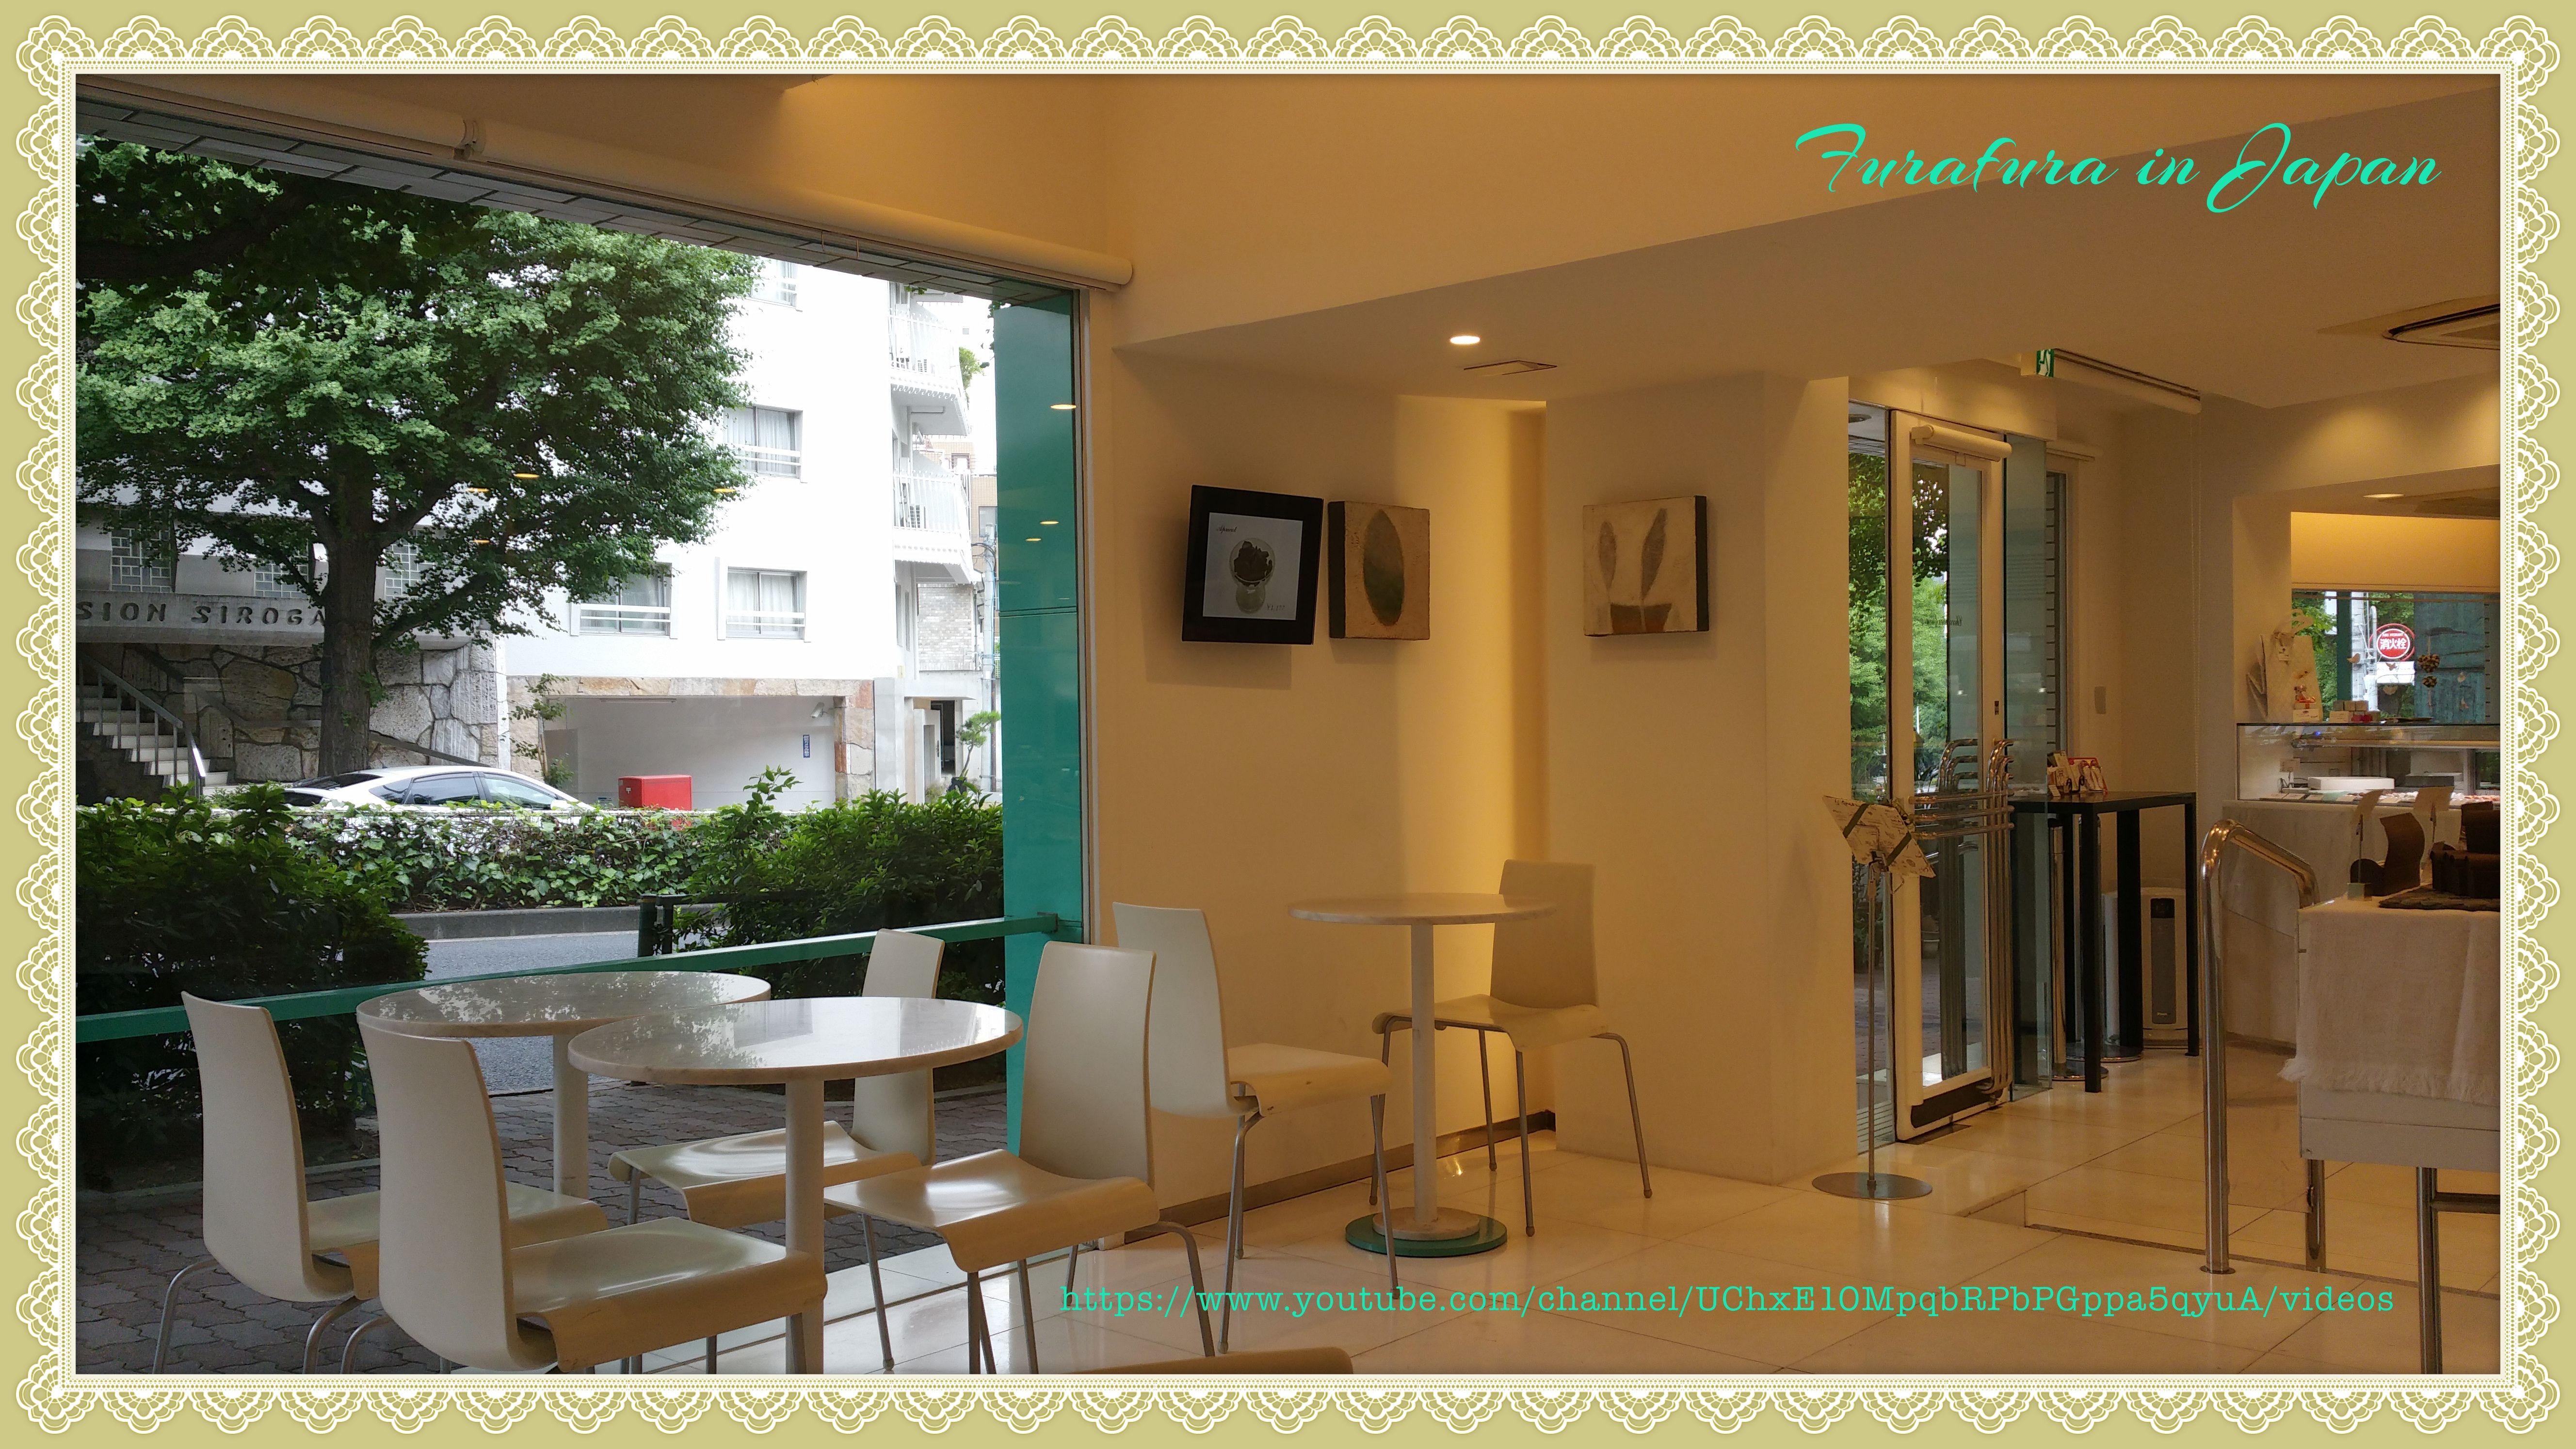 #japan#tokyo#cafe#cafetería#café#coffeeshop#japanesecoffeeshop#japanesecafe#cafetokyo#cafejapan#tokyocafe#japancafe#coffeeshoptokyo#coffeeshopjapan#tokyocoffeeshop#japancoffeeshop#specialtycoffee#cafédeespecialidad#cafésespeciais#cafésdespécialité#caffè#caffetteria#specialitàdicaffè